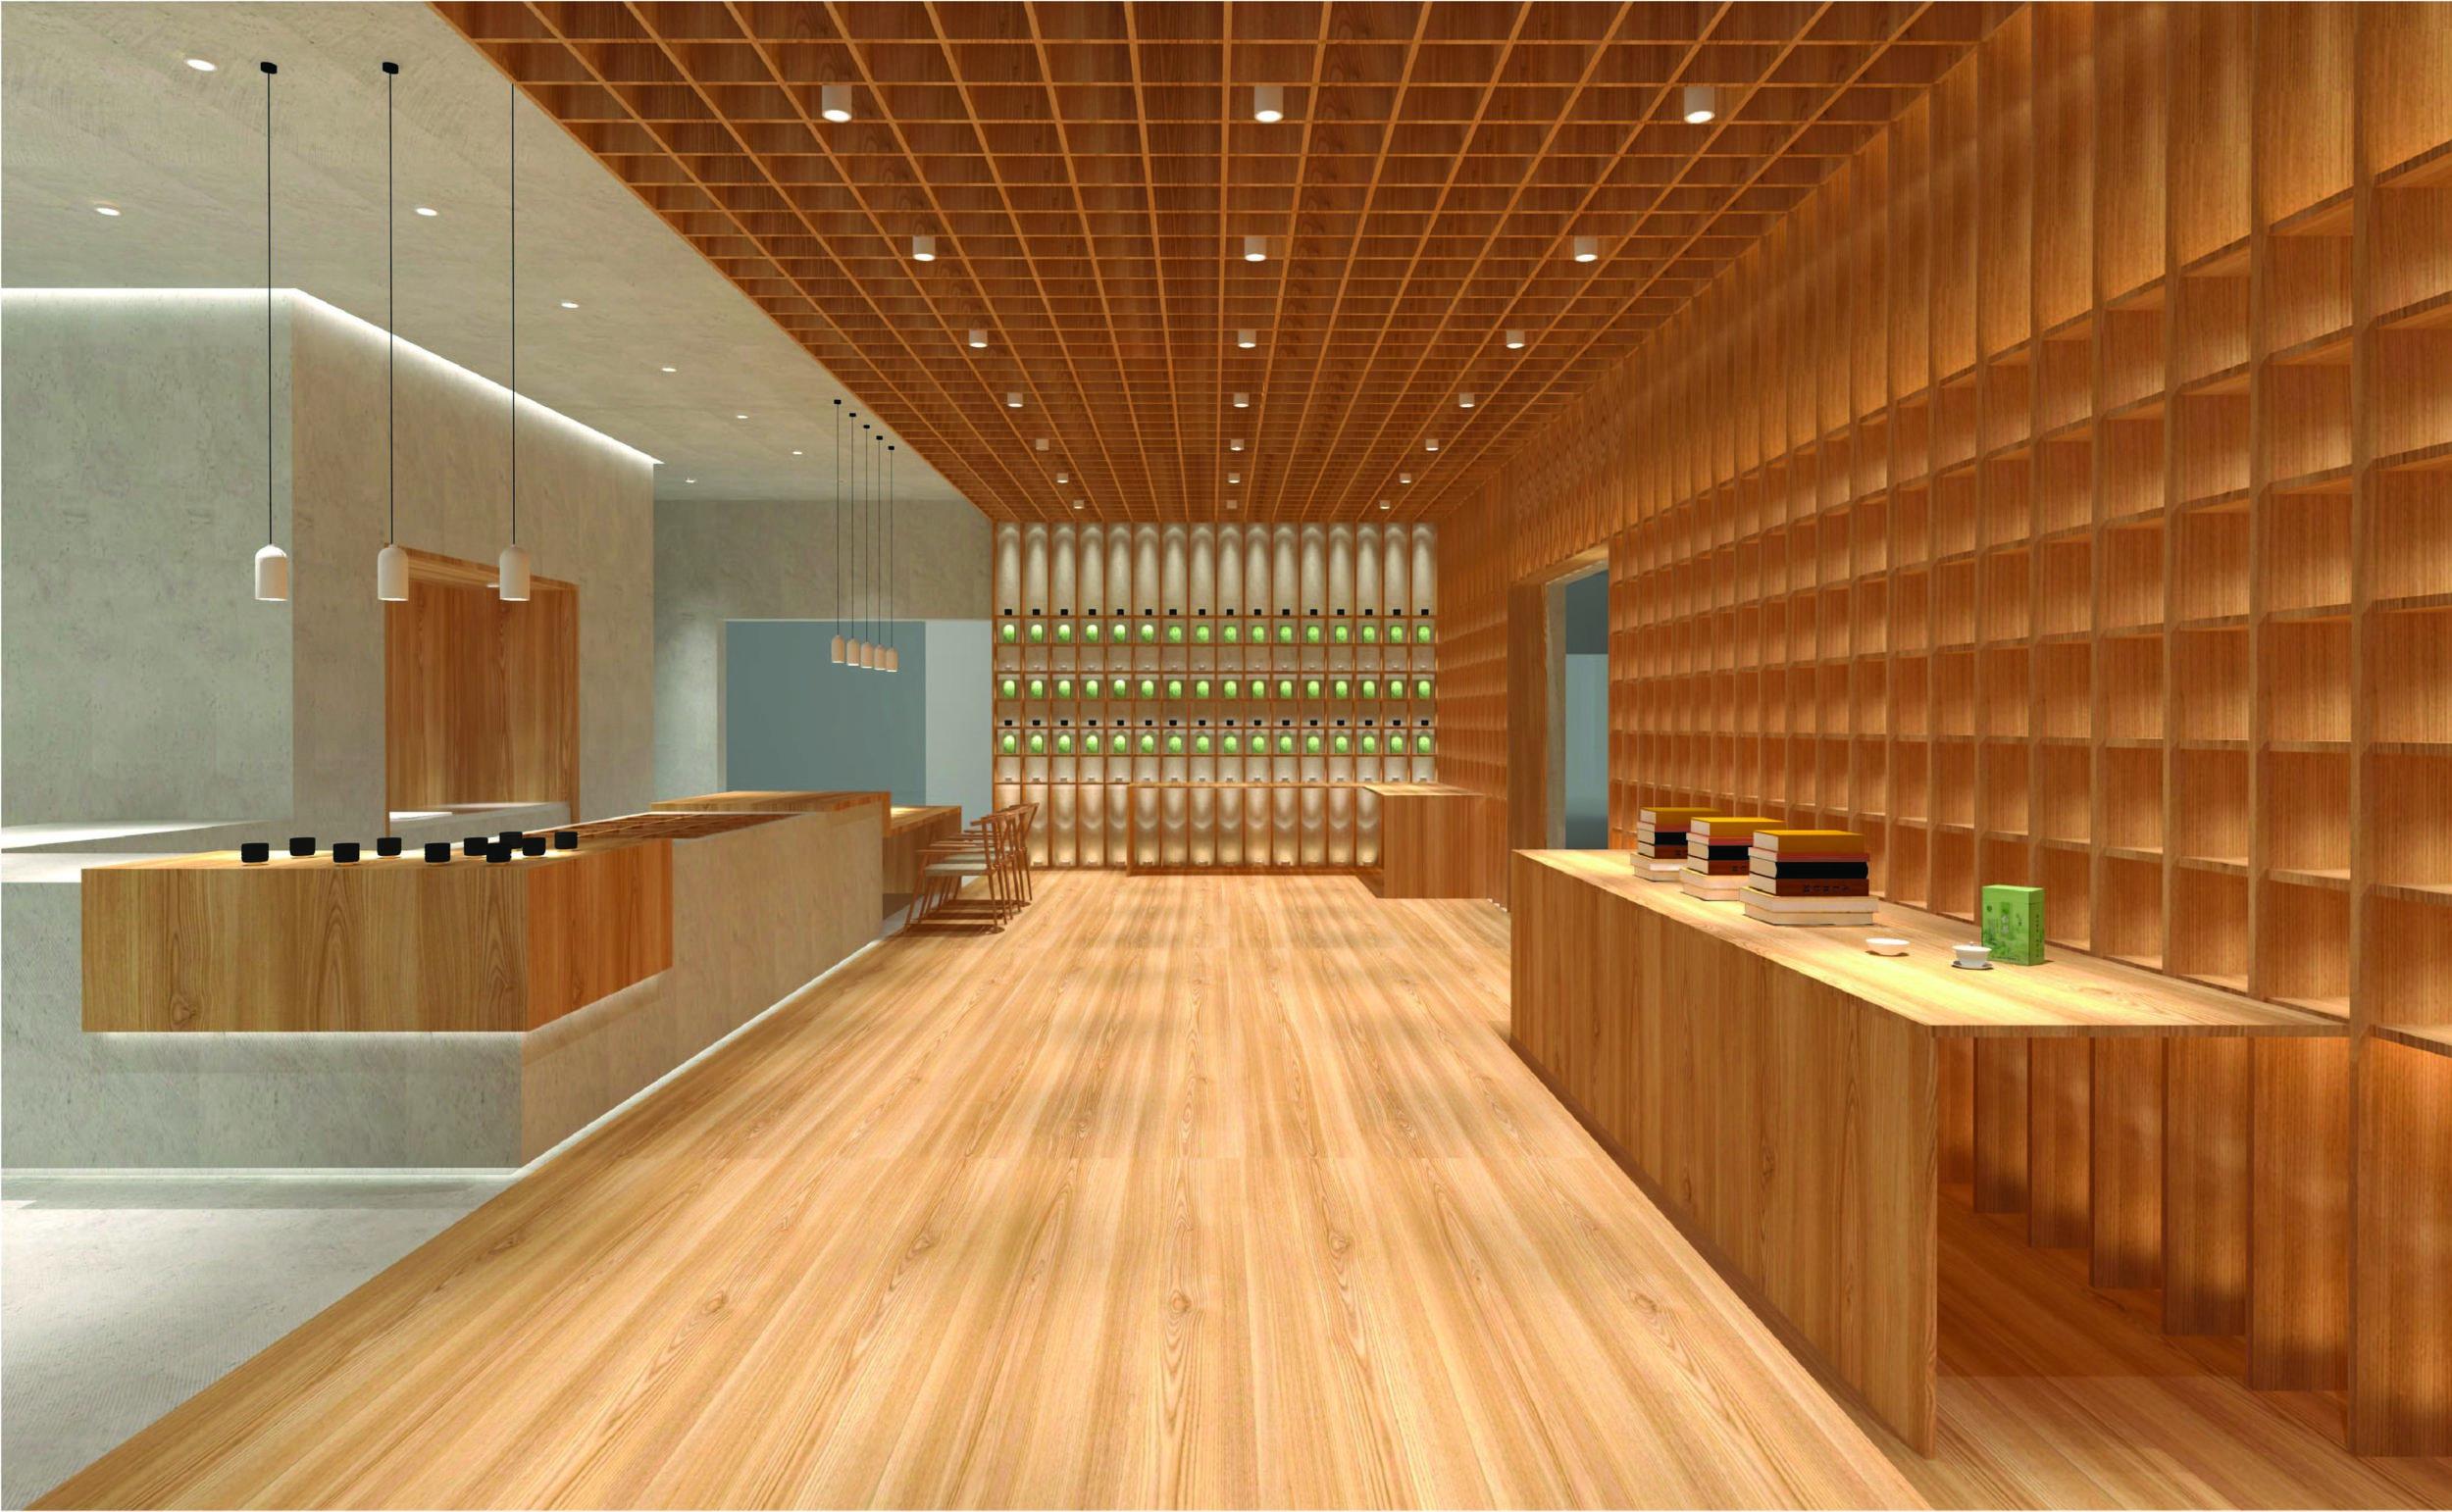 wenbo-da-mfa-2-china-box--west-15th-street-and-10th-ave_35287931385_o.jpg